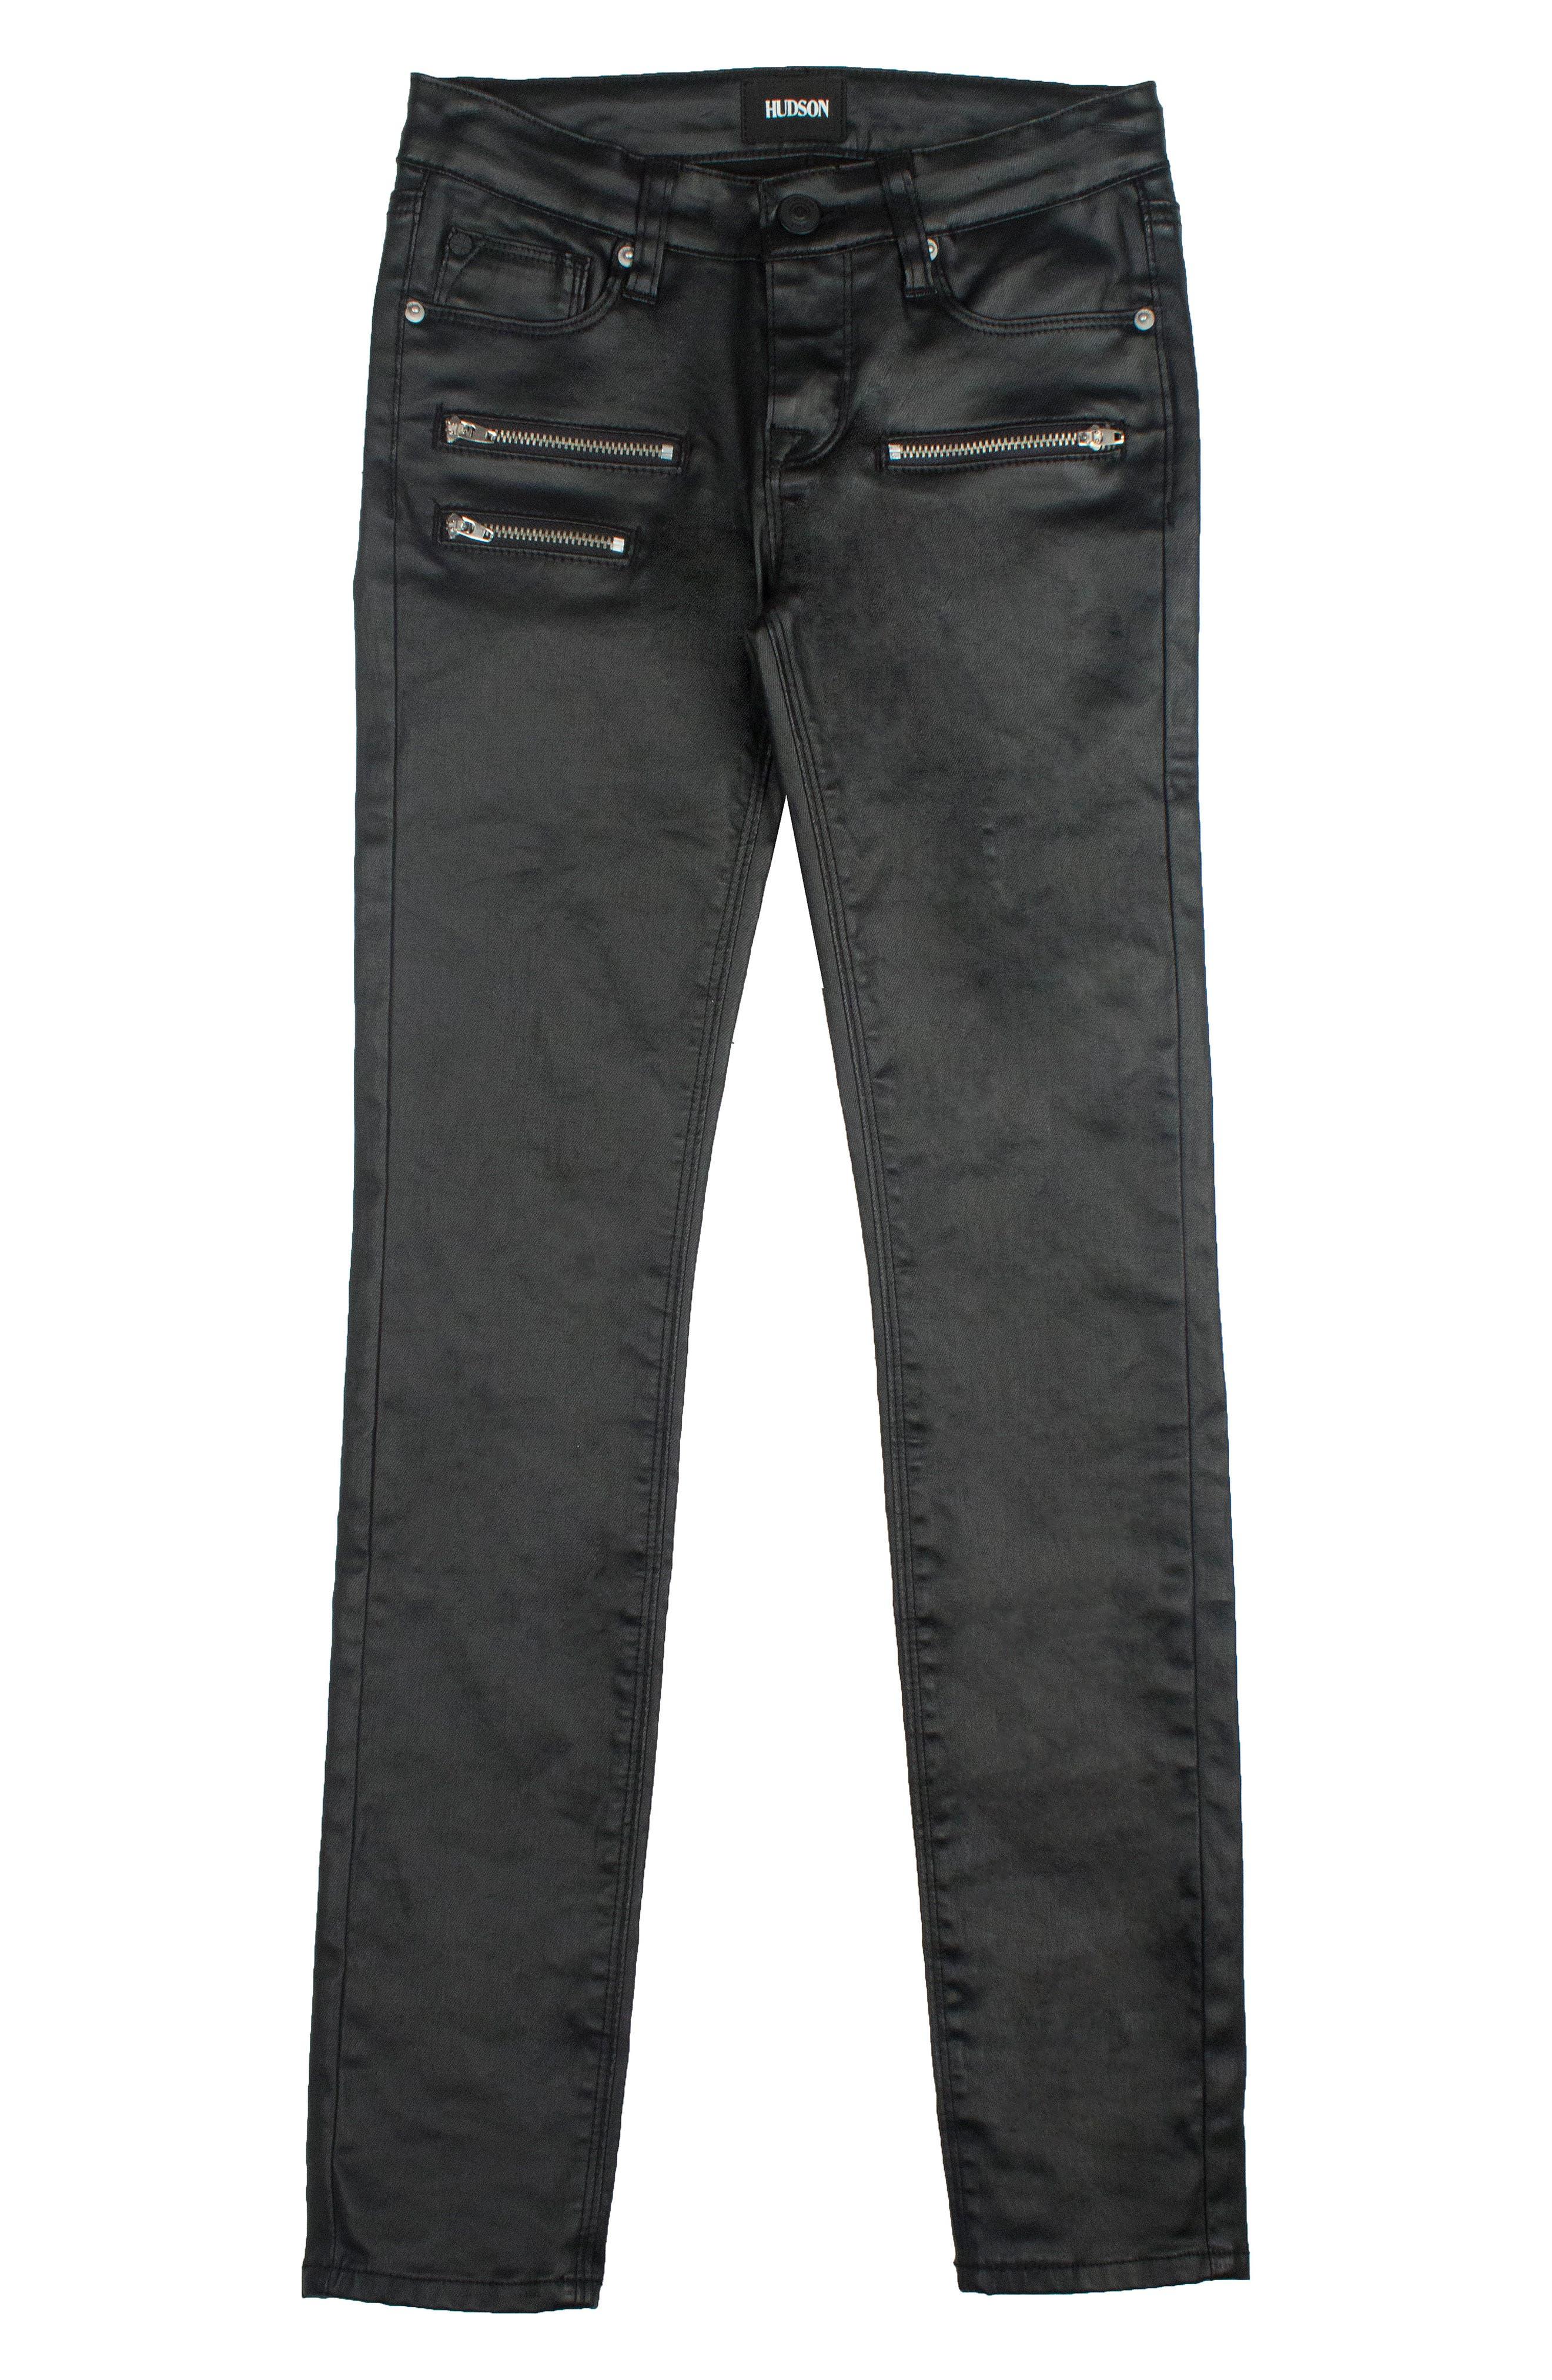 HUDSON KIDS,                             Ziggy Skinny Jeans,                             Main thumbnail 1, color,                             003